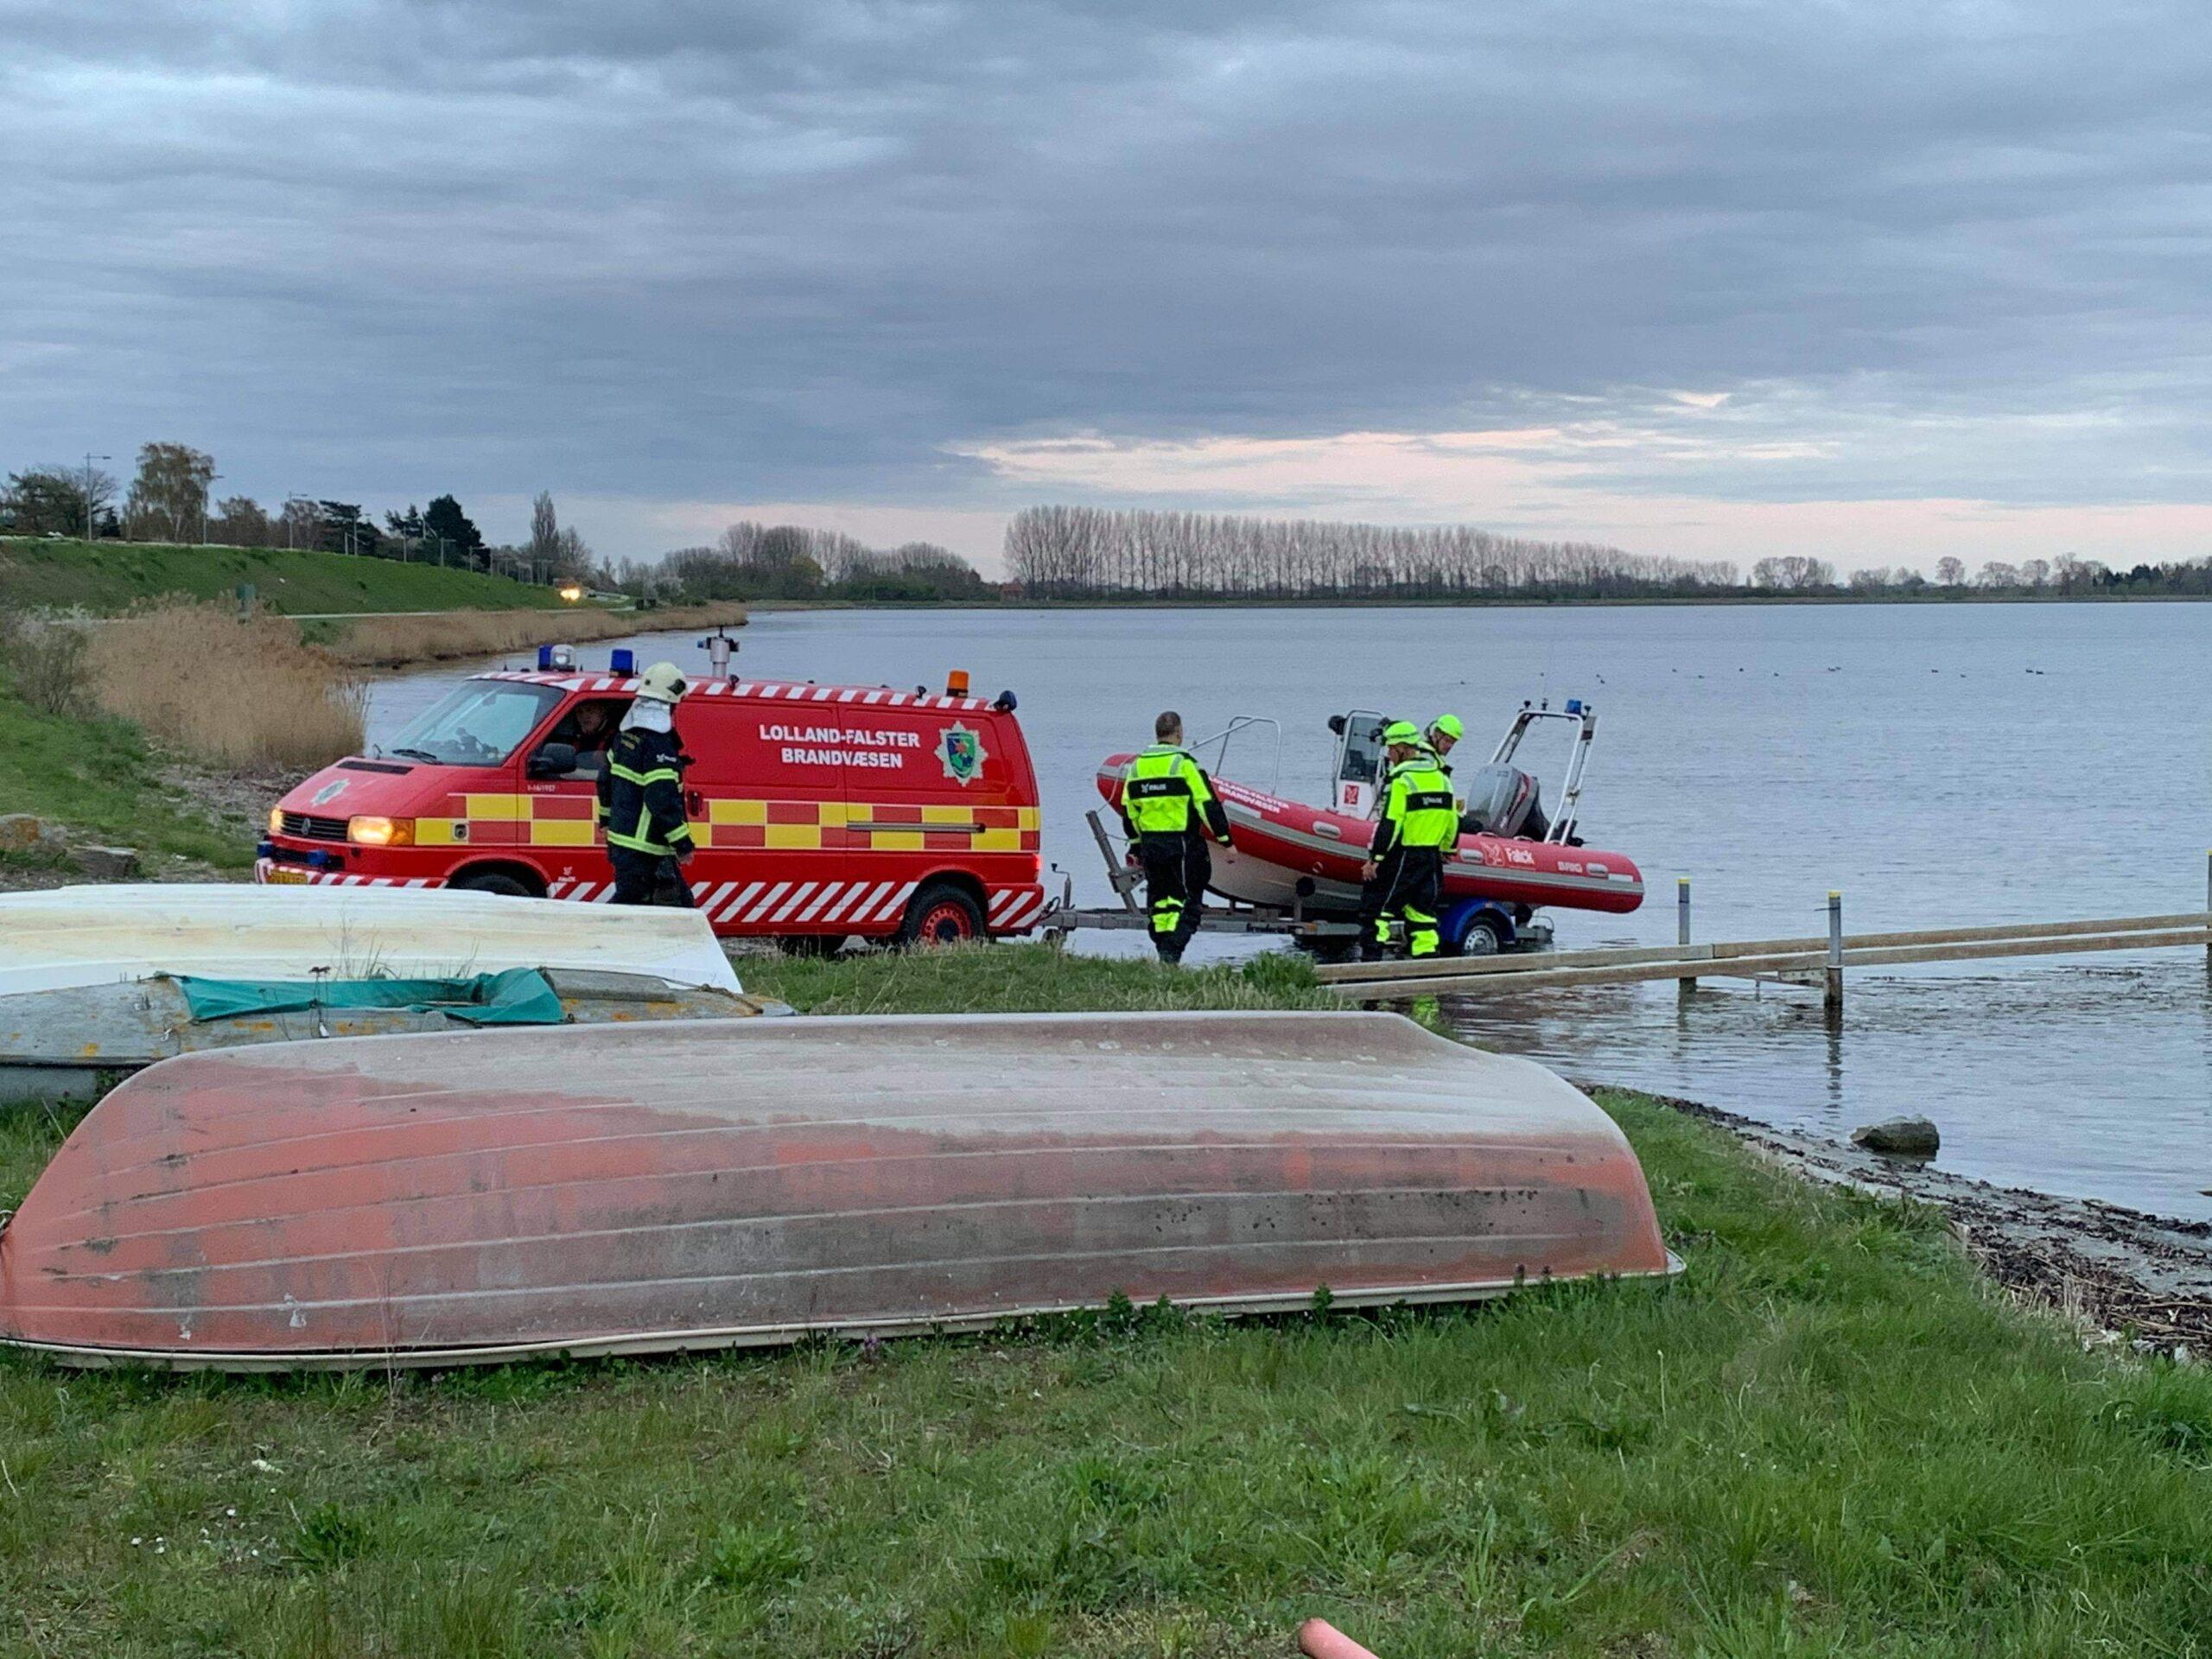 Mulig drukneulykke i Nykøbing Falster